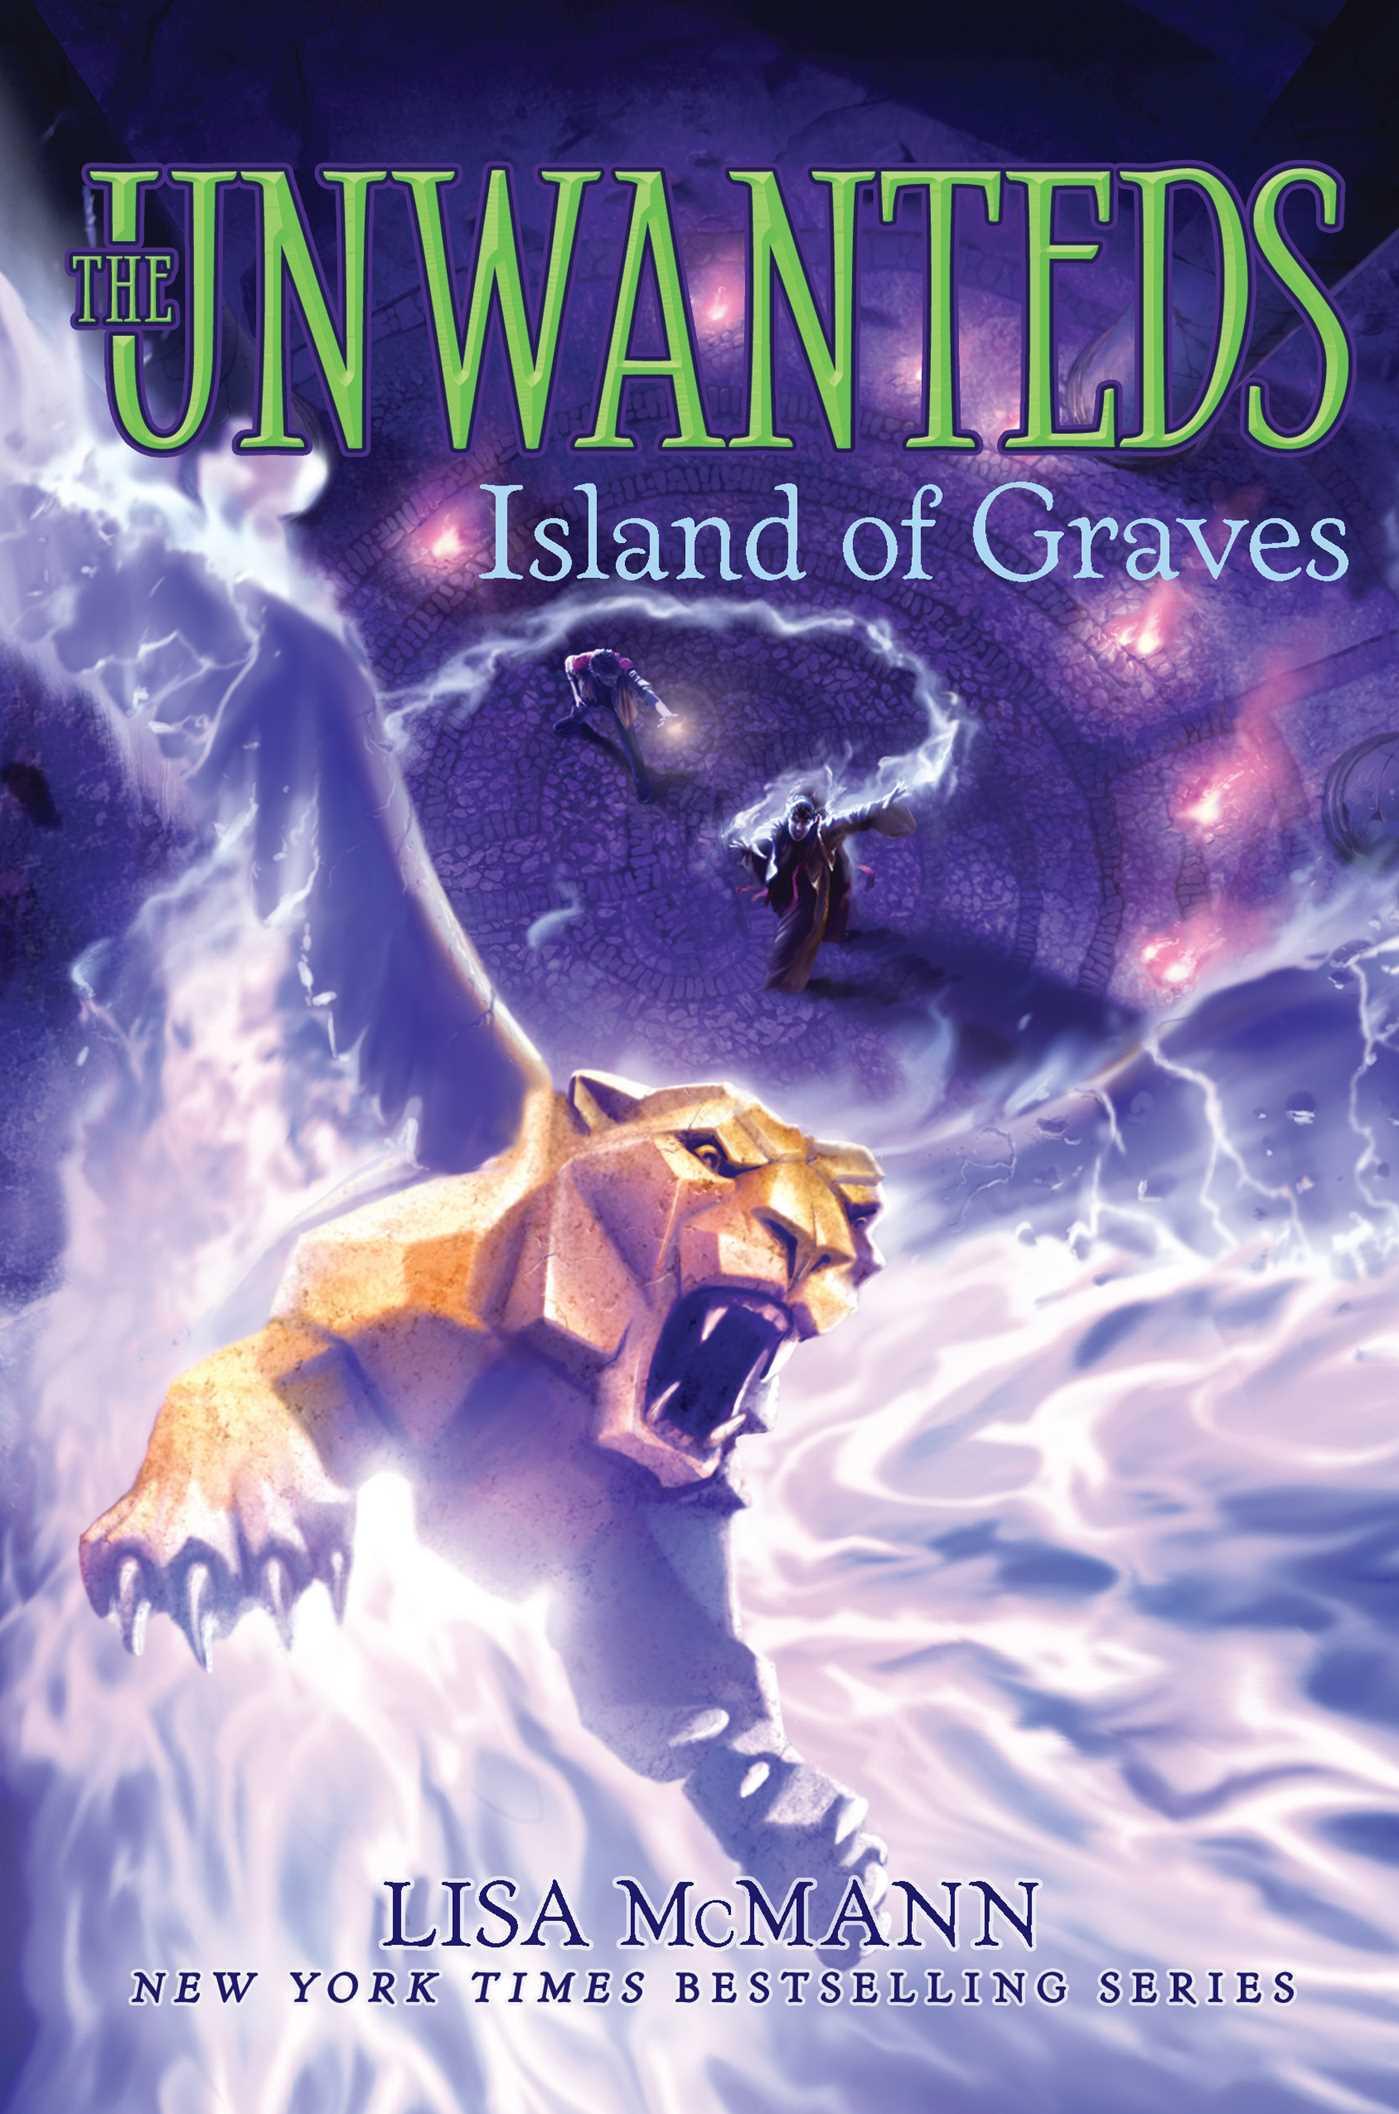 Island of graves 9781442493360 hr